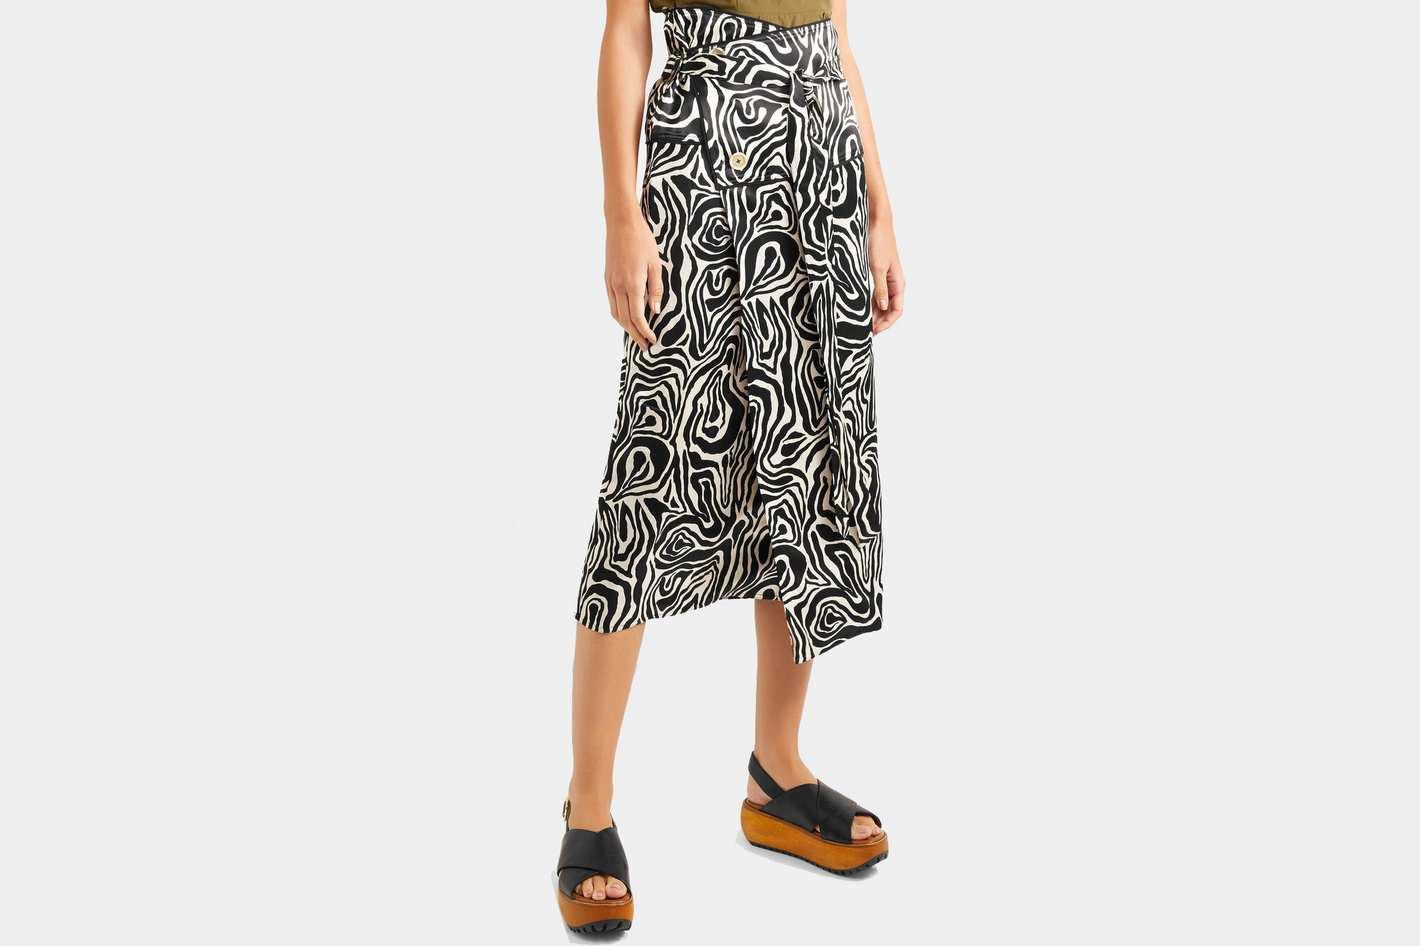 Marni Zebra-Print Crepe Wrap Skirt